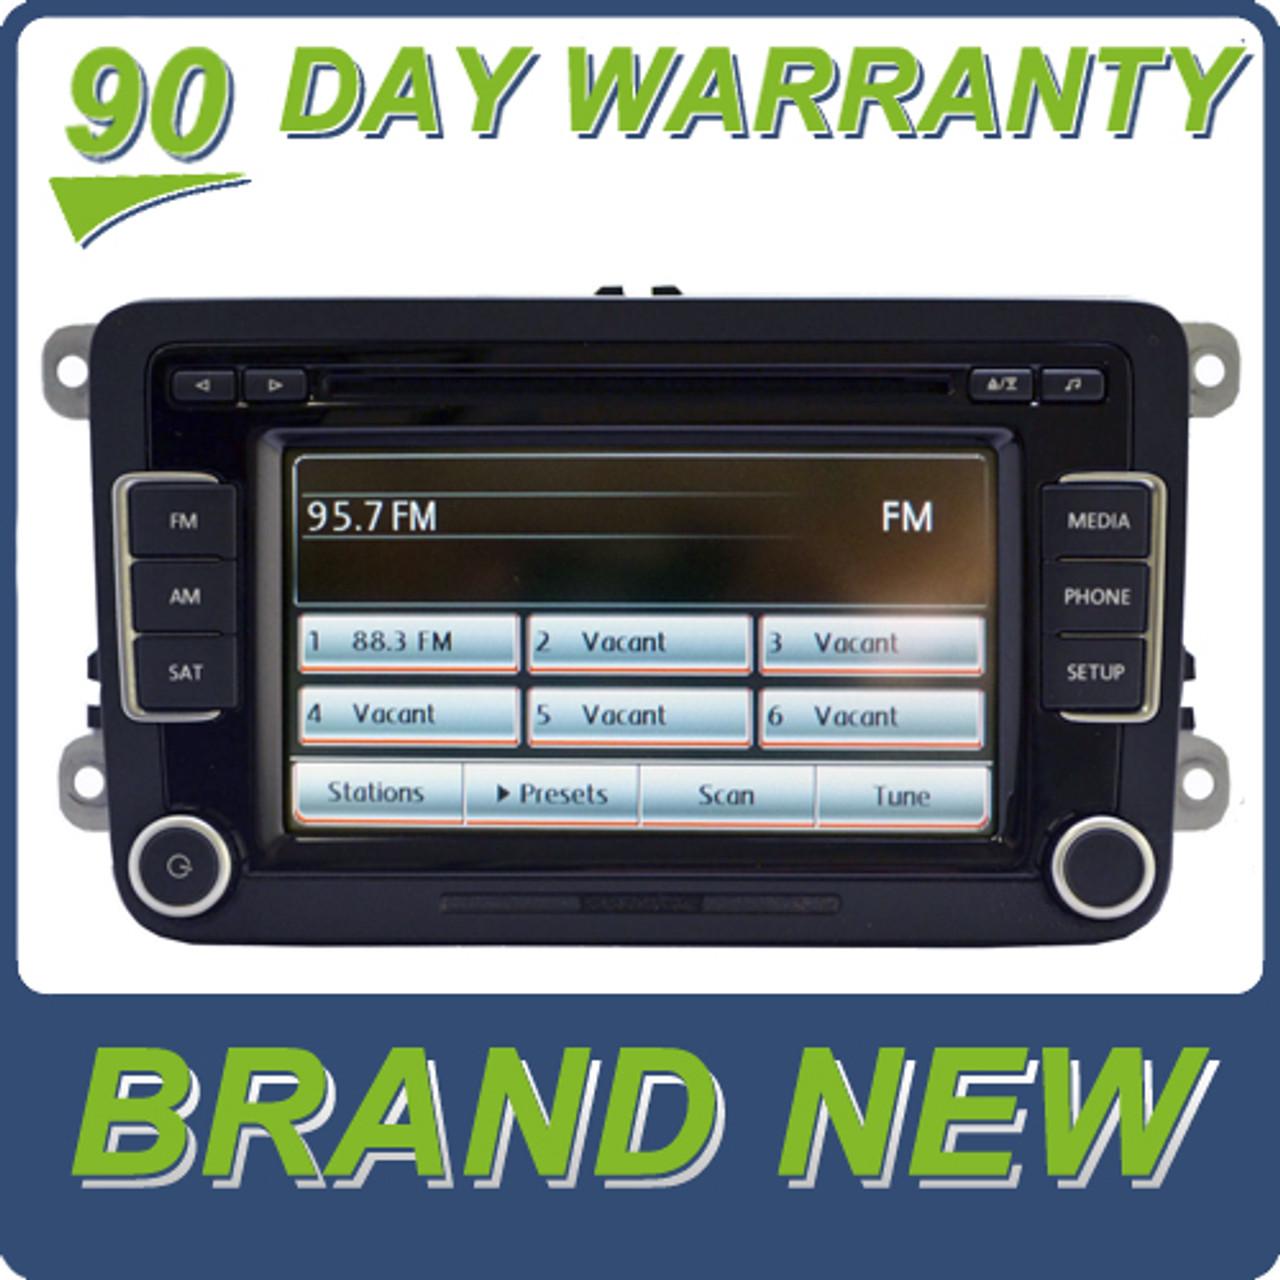 Merged 2010 2011 2012 NEW VW Volkswagen Jetta Passat Golf GTI Rabbit EOS  Radio Stereo 6 Disc Changer CD Player Touch Screen SD Mp3 Sirius Satellite